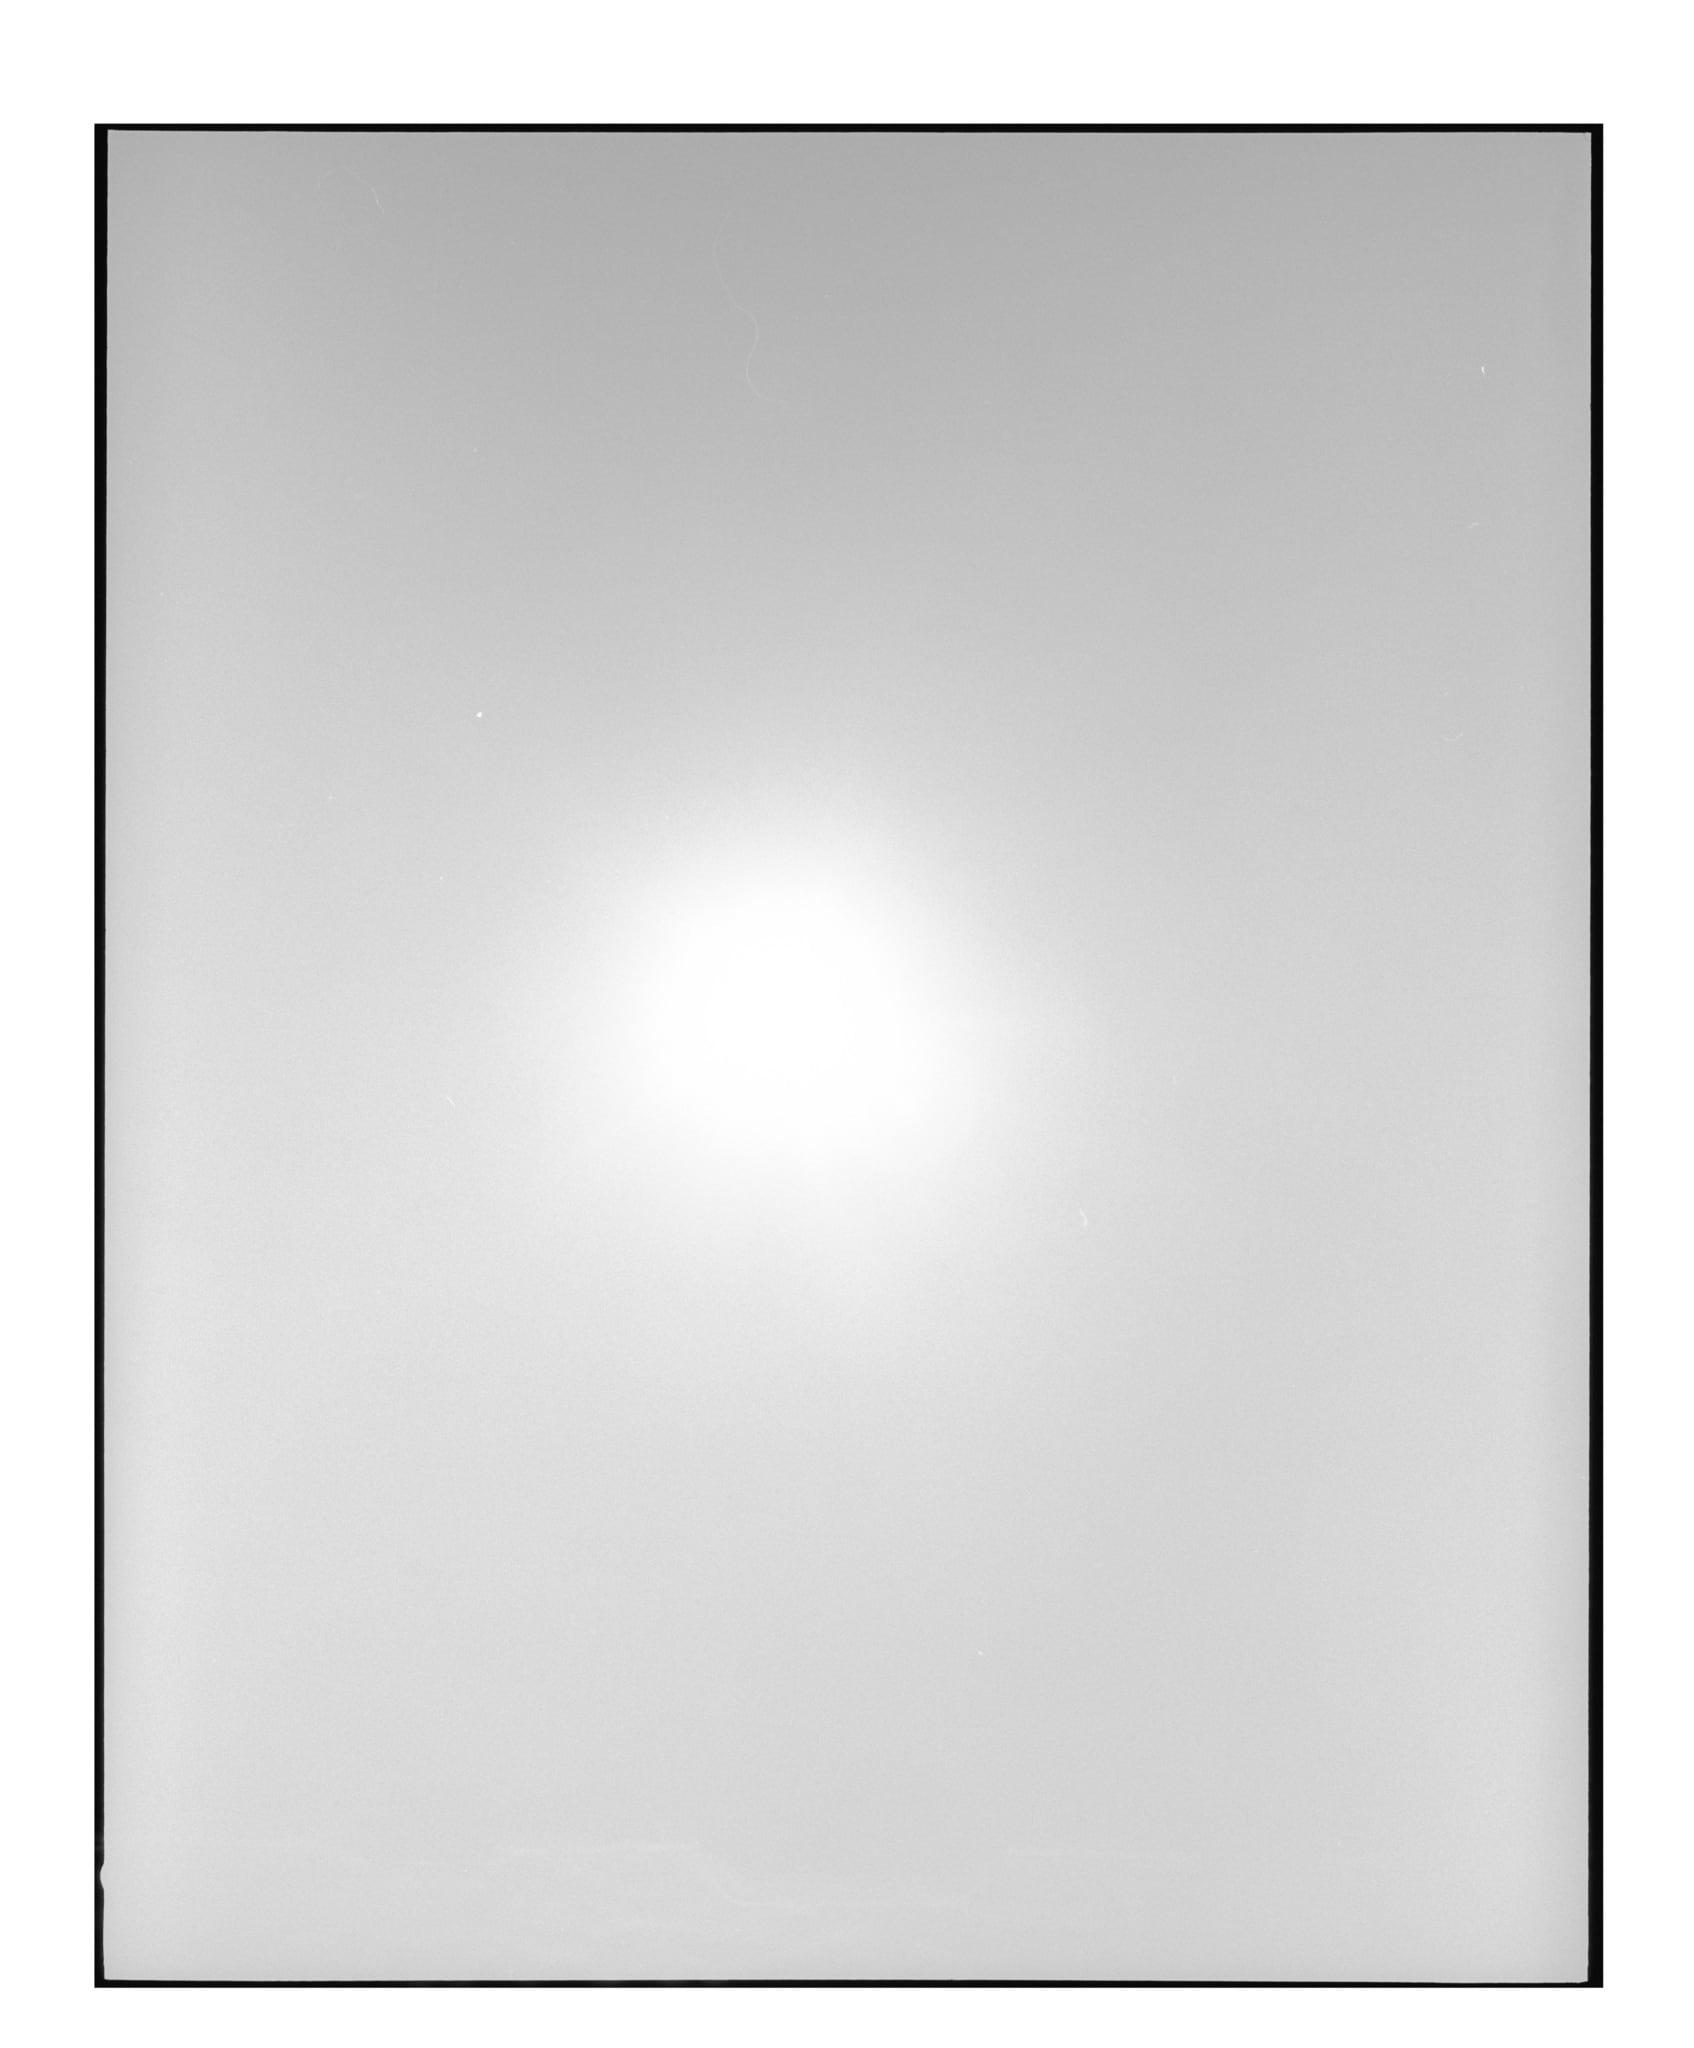 January 27, frame 9 by Zoe Leonard